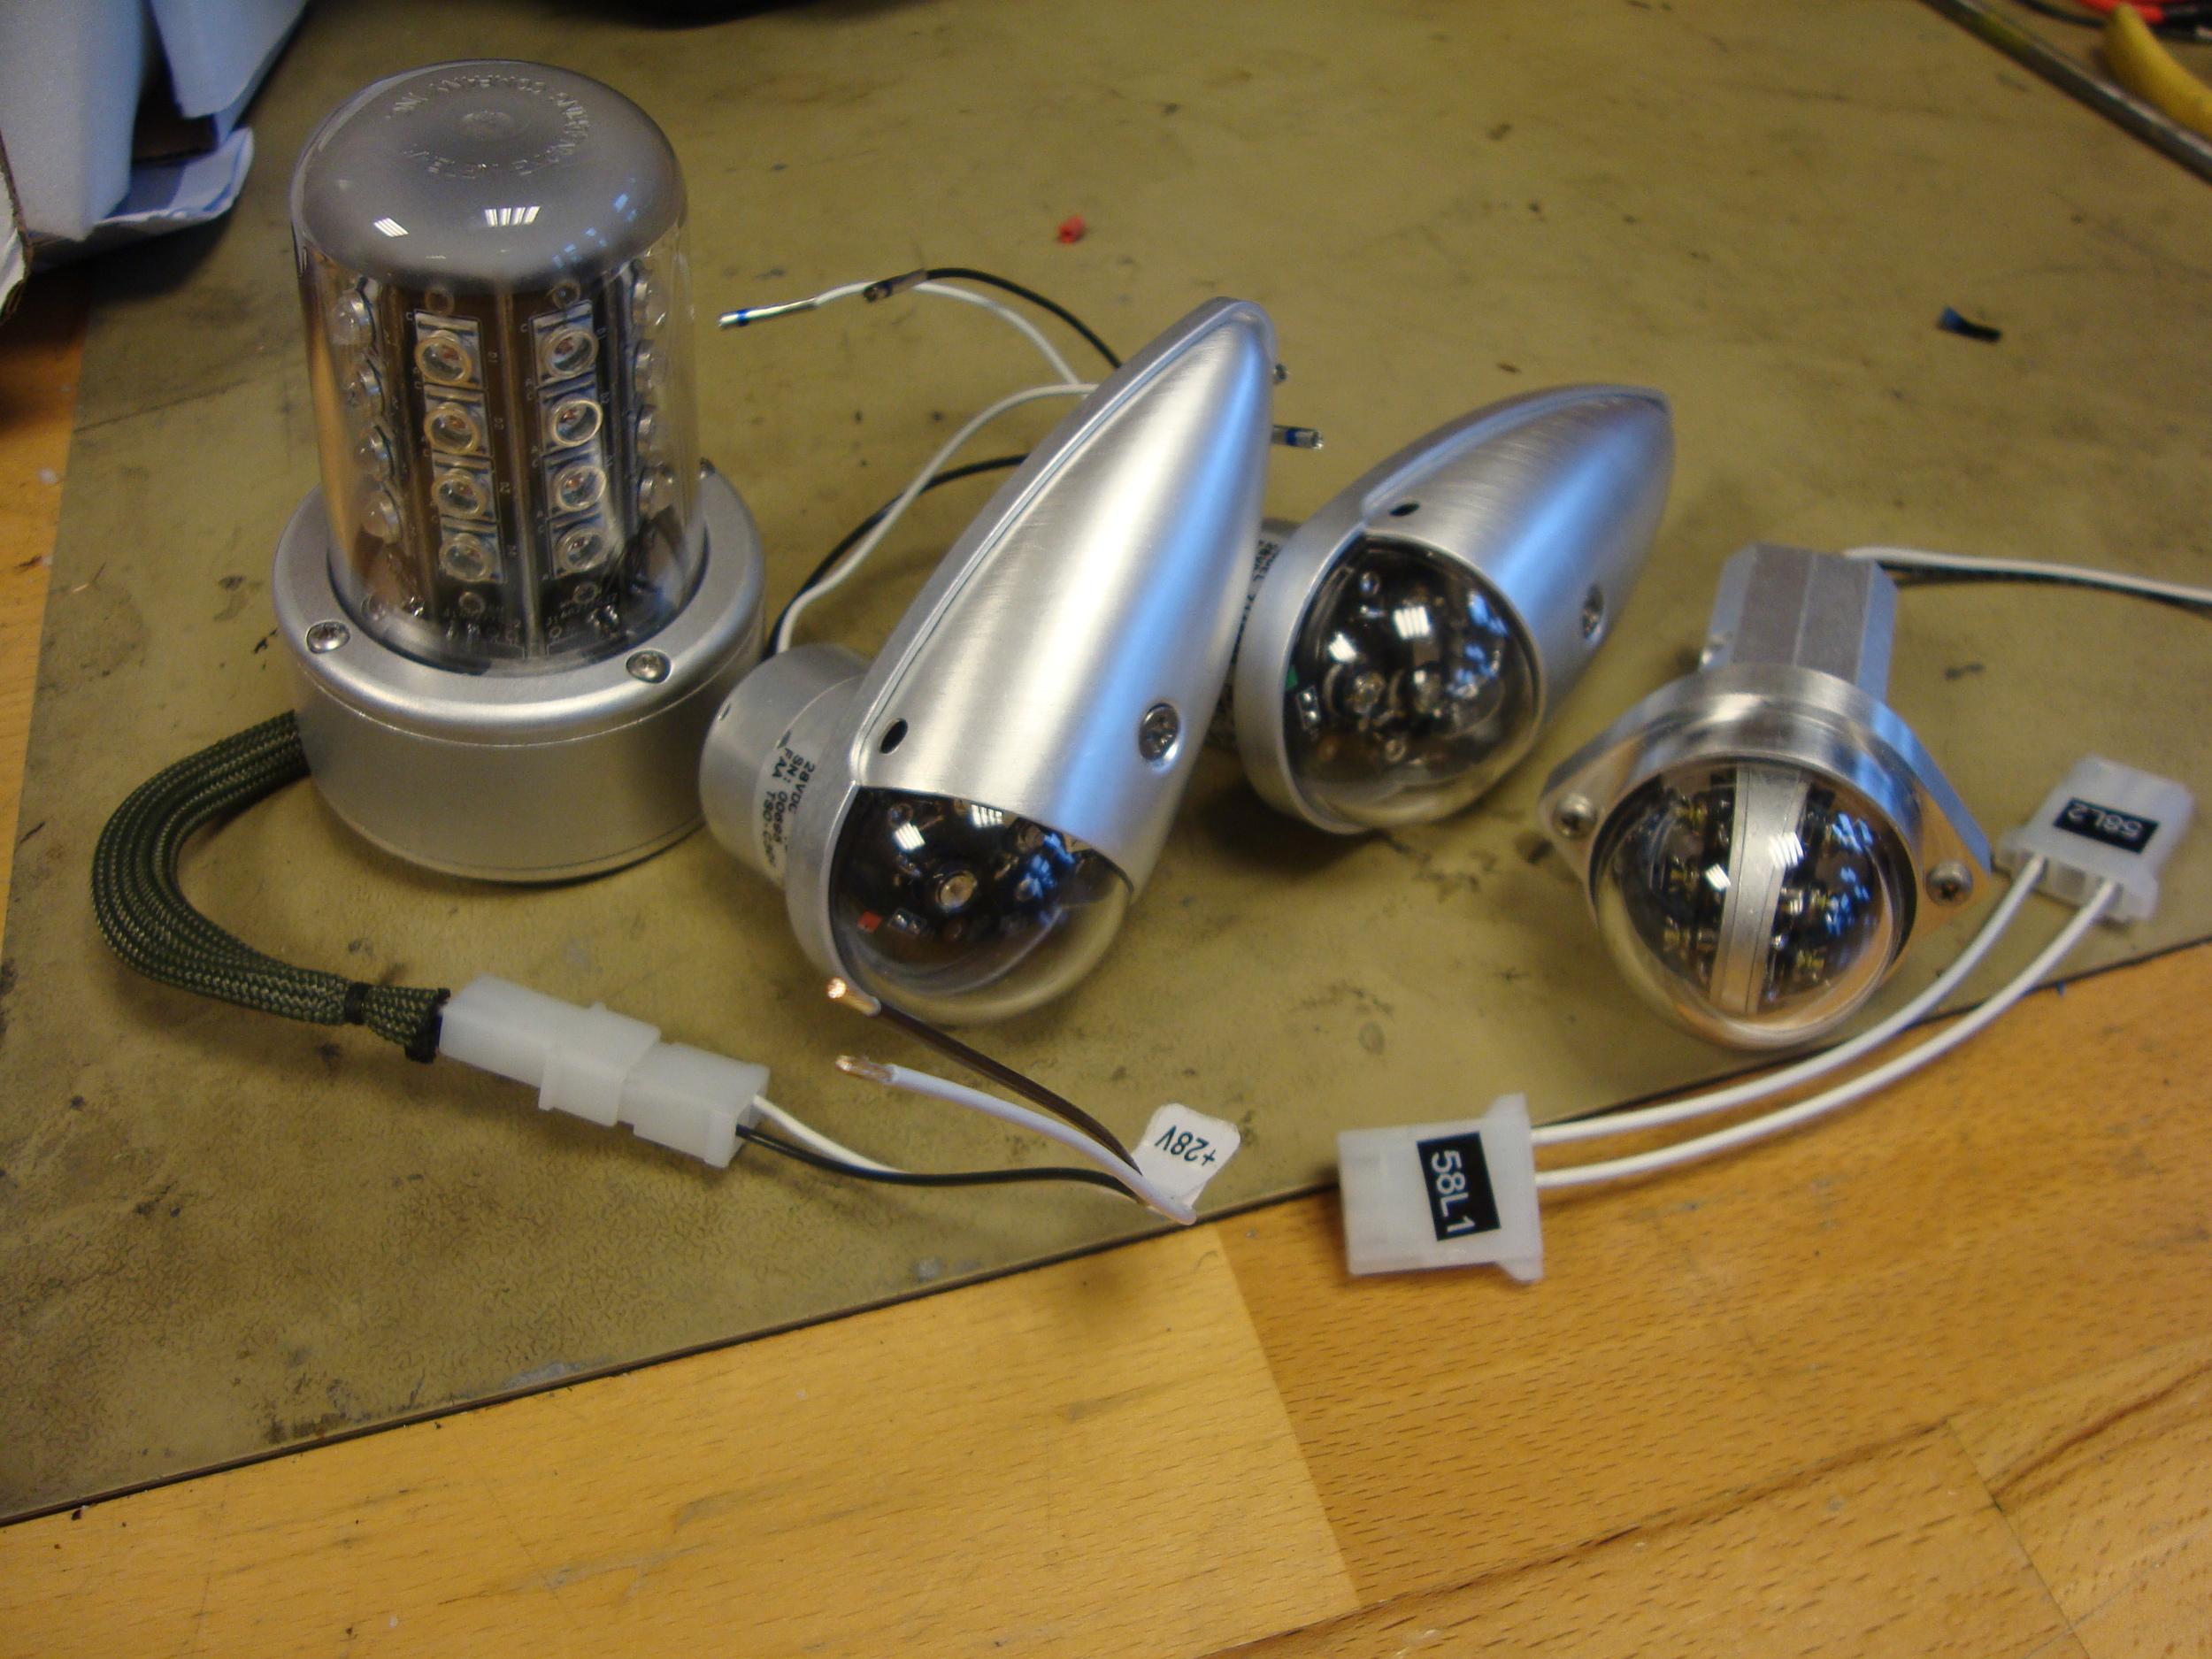 External NVIS Led Lights